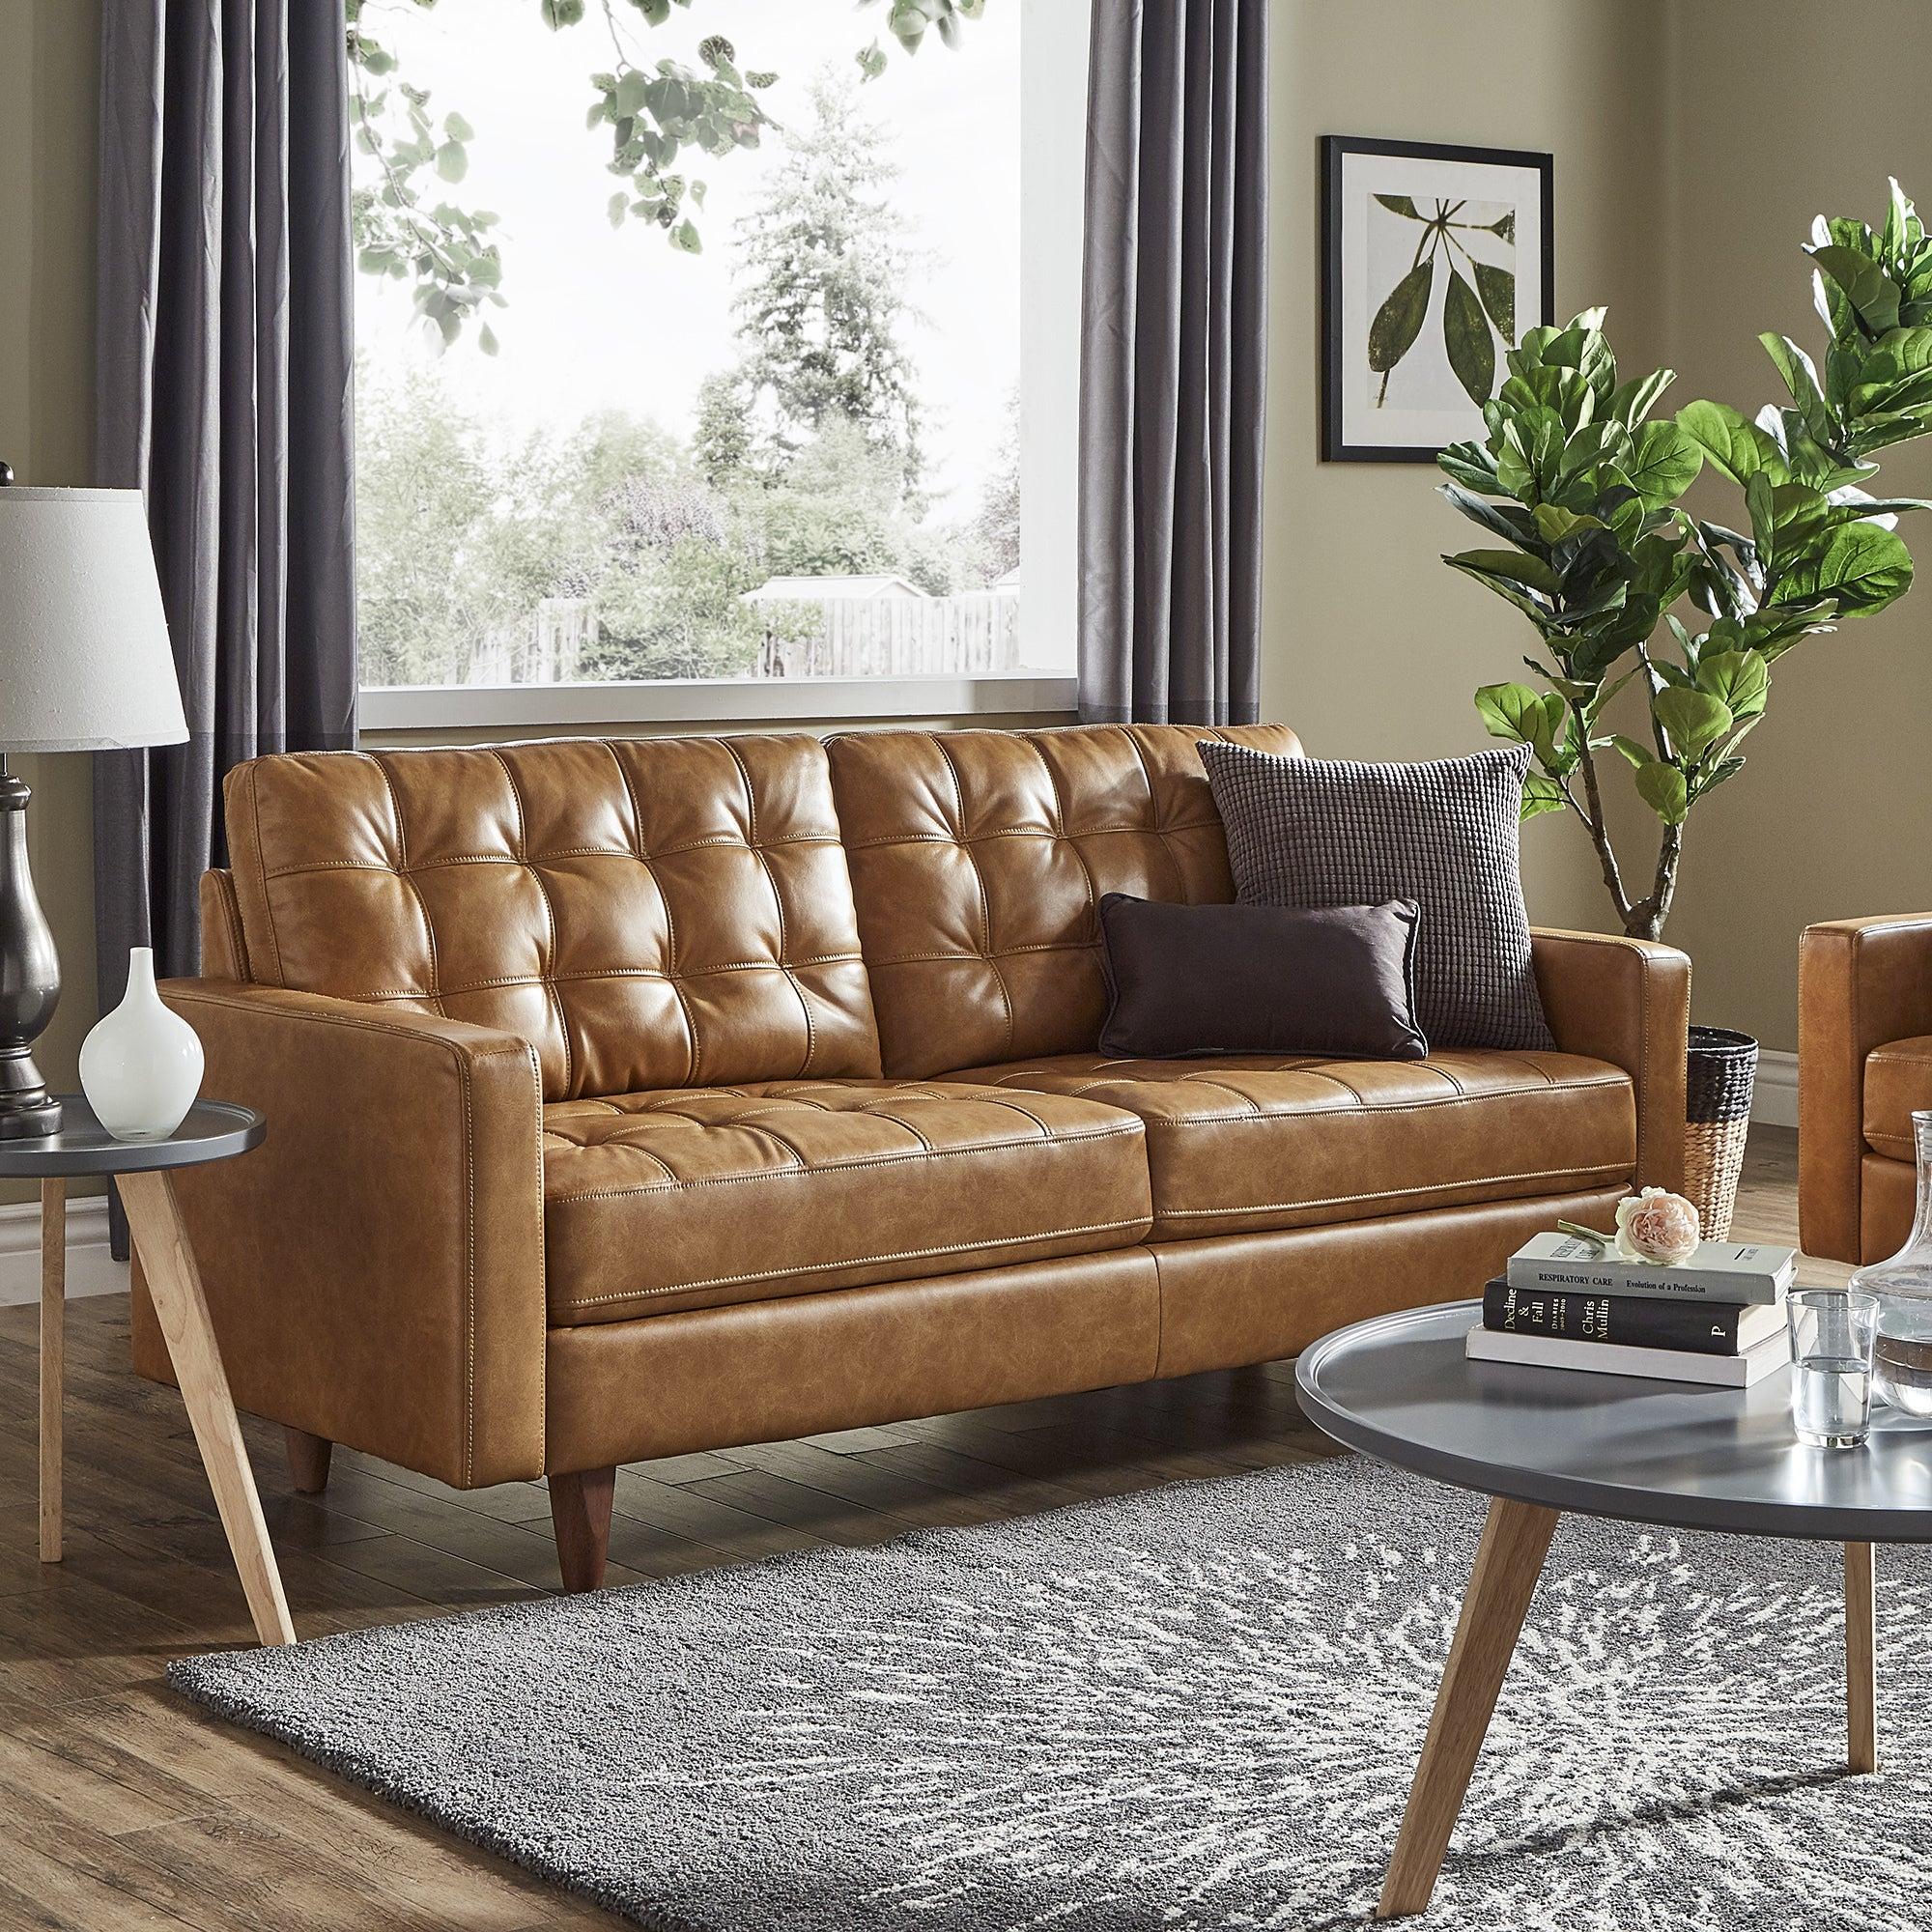 Shop Black Friday Deals On Odin Caramel Leather Gel Sofa By Inspire Q Modern Overstock 19743982